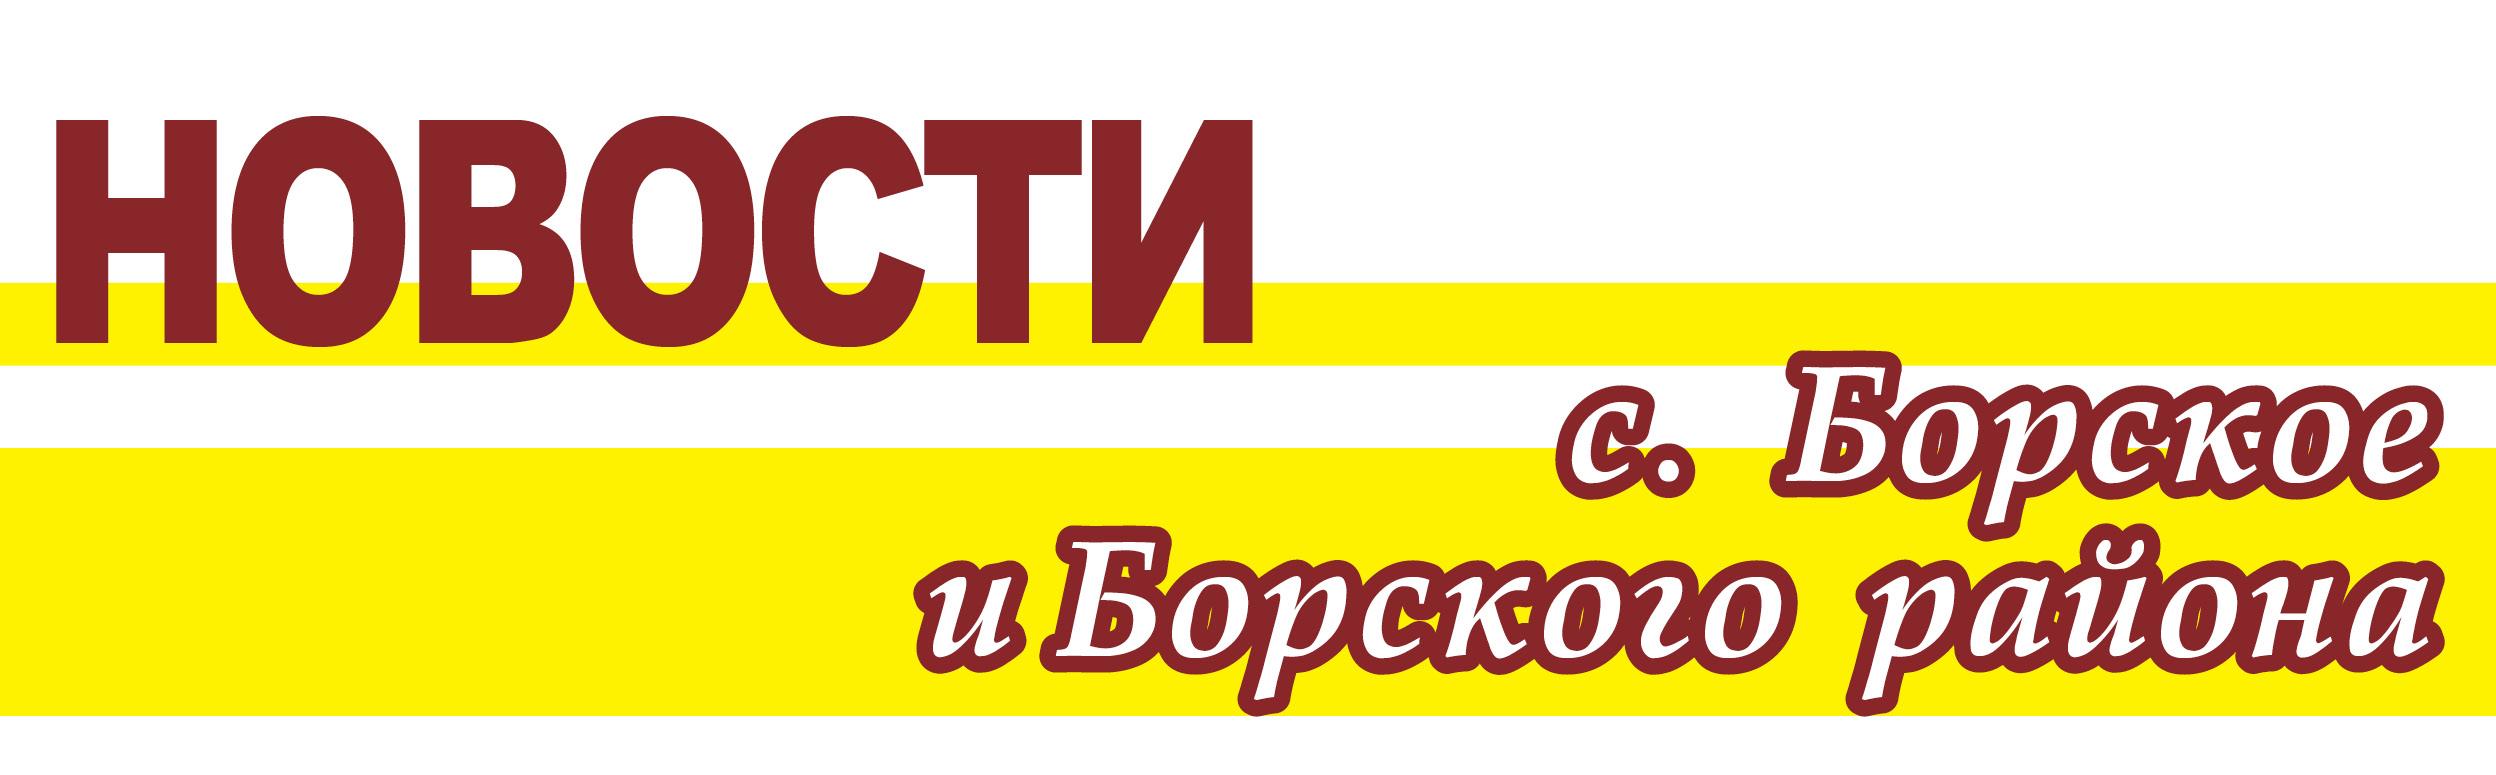 цзн борское самарской области